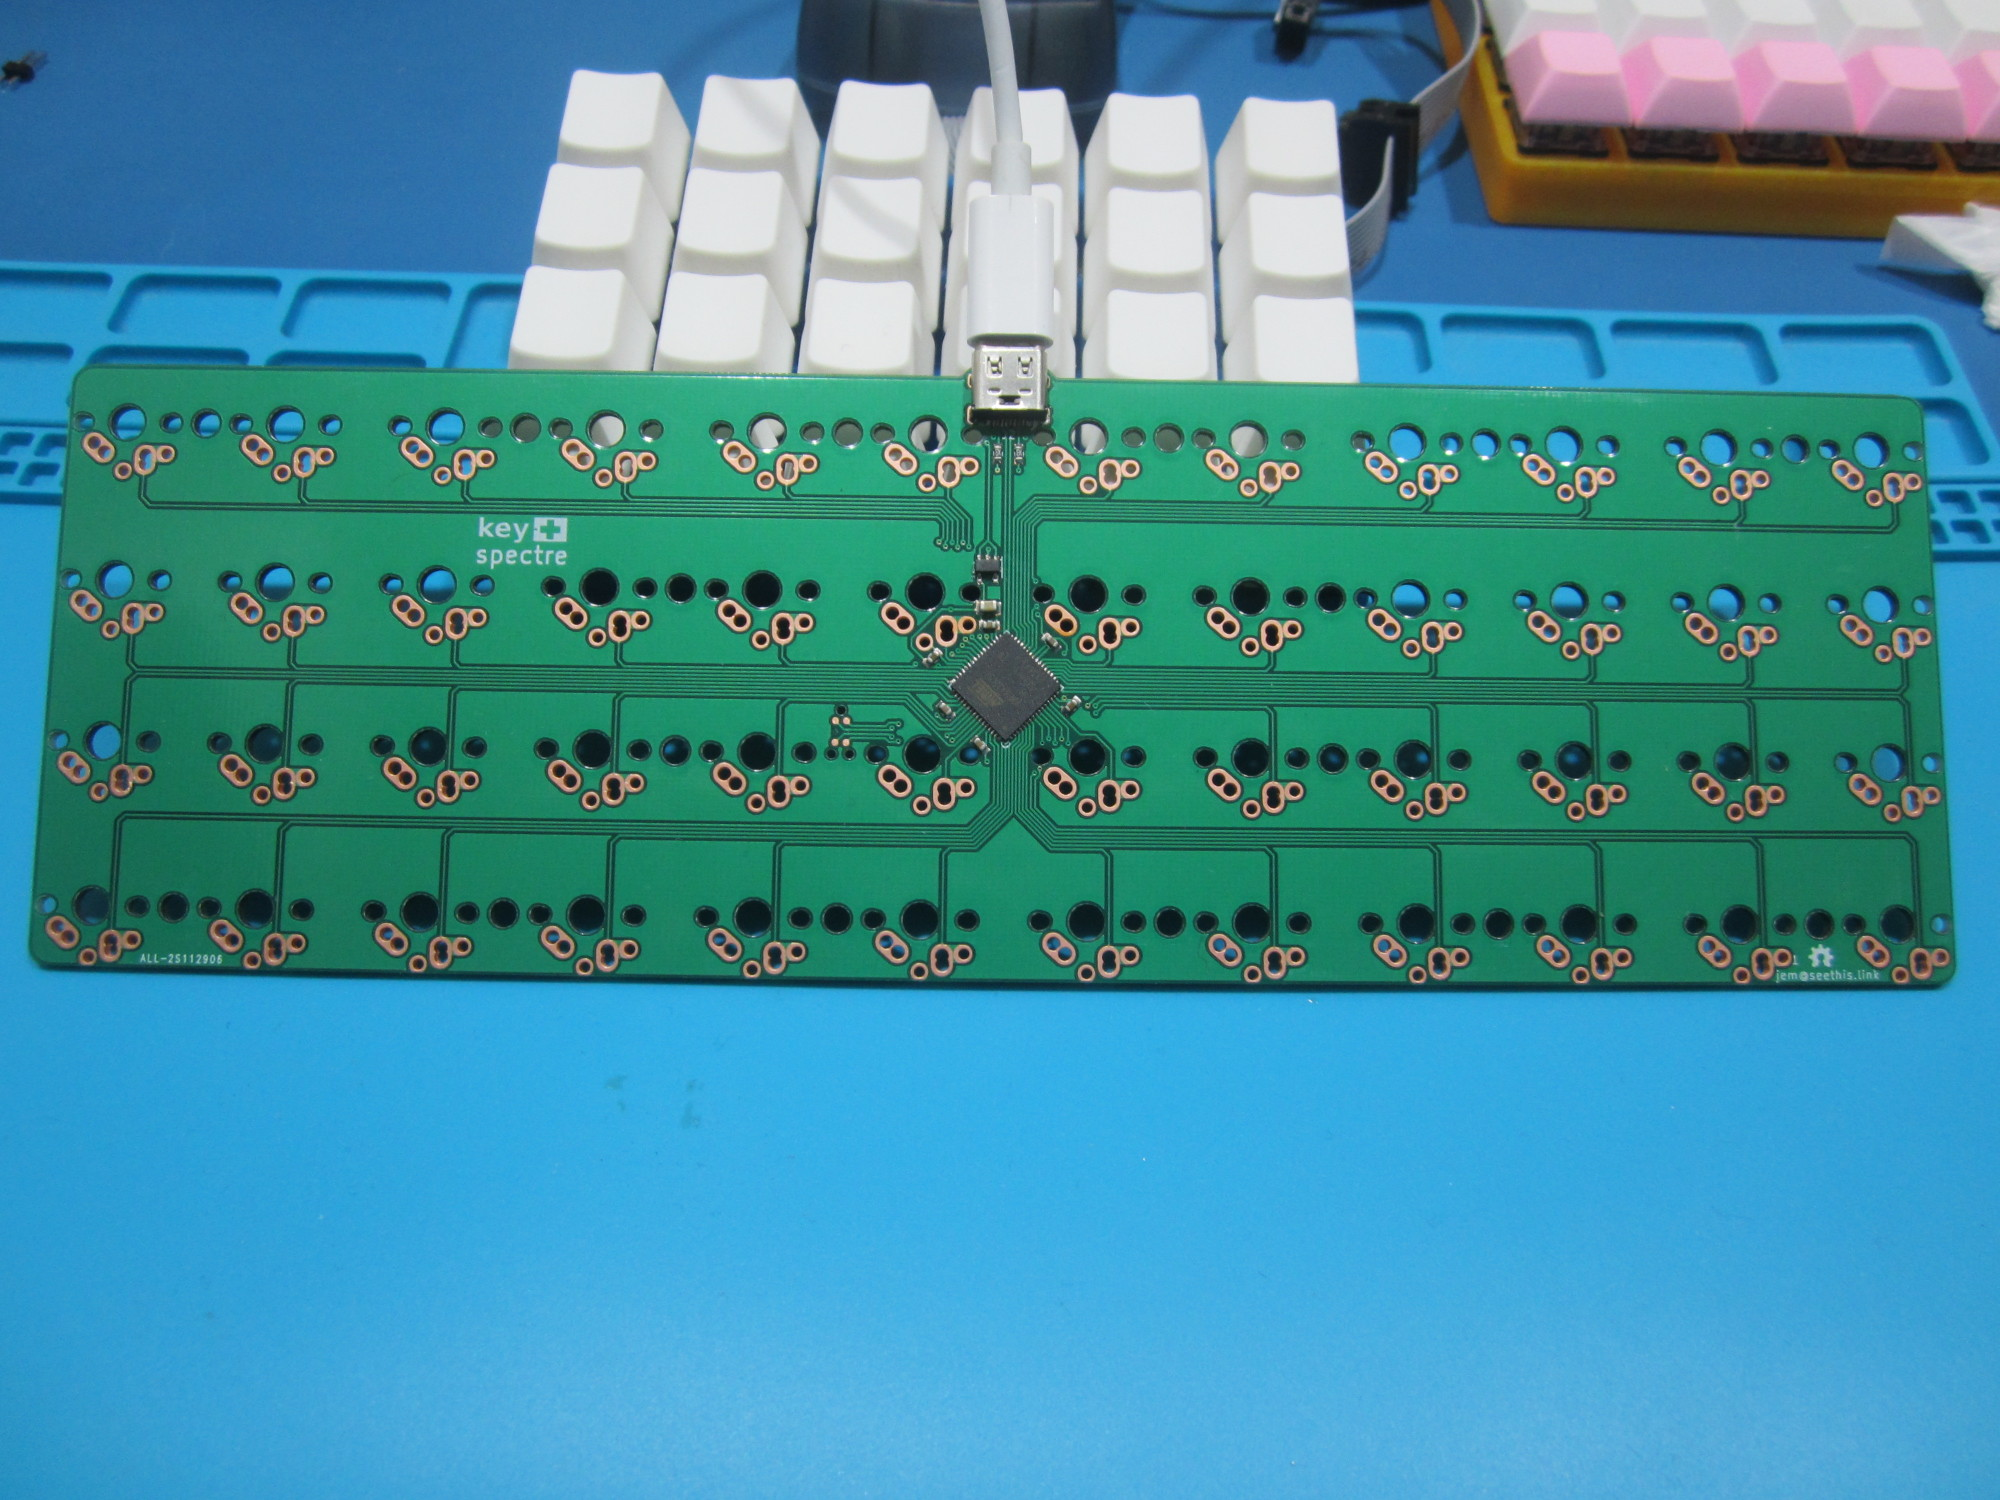 Image of keyplus spectre